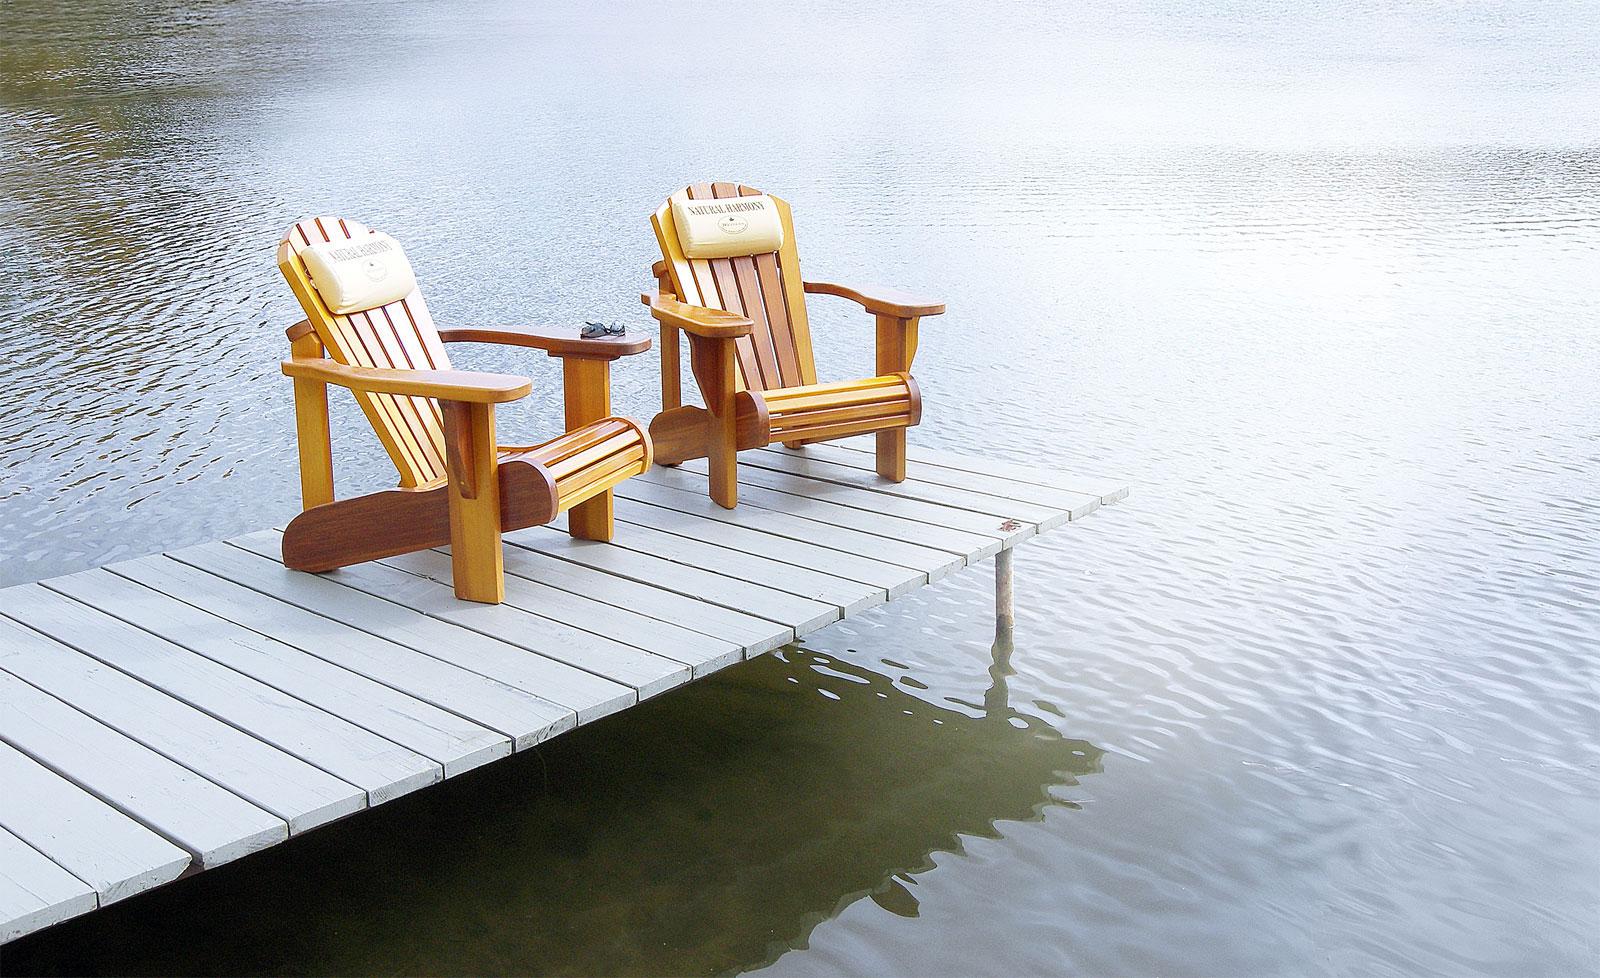 Shop - Canadian Whirlpools Outdoor Whirlpool Wellness Eigenen Garten